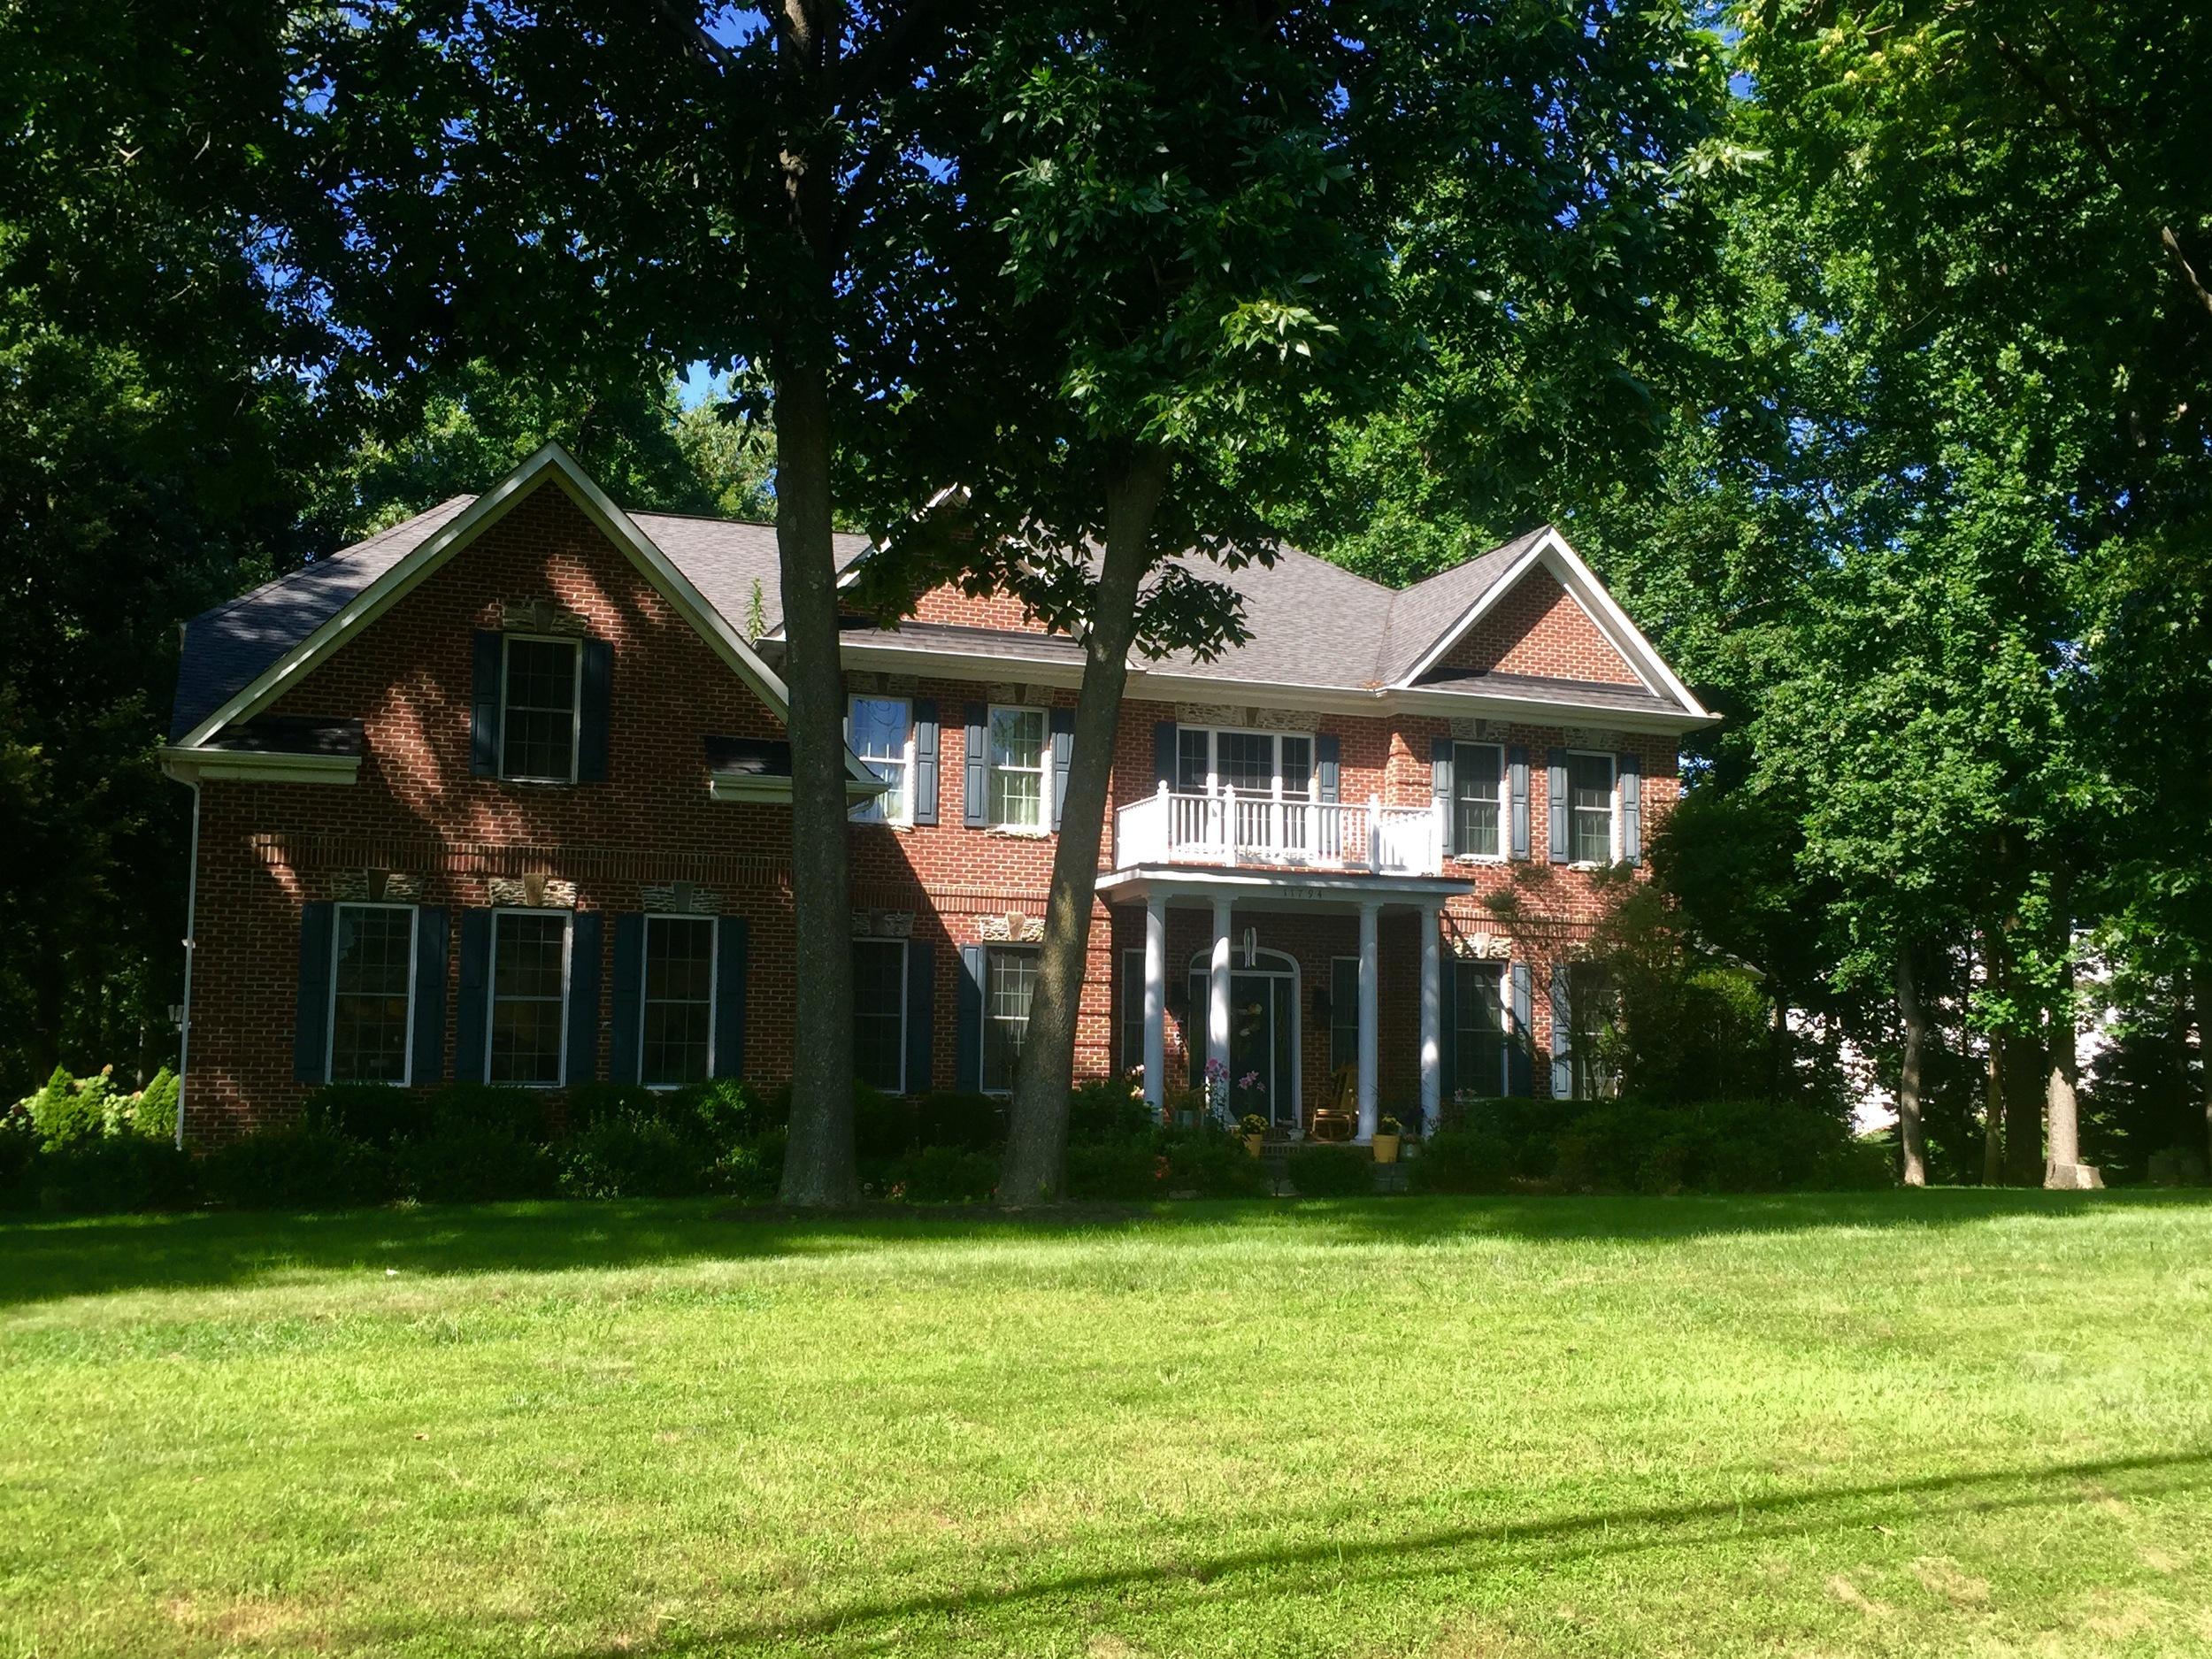 rylea-homes-custom-home-25.jpg